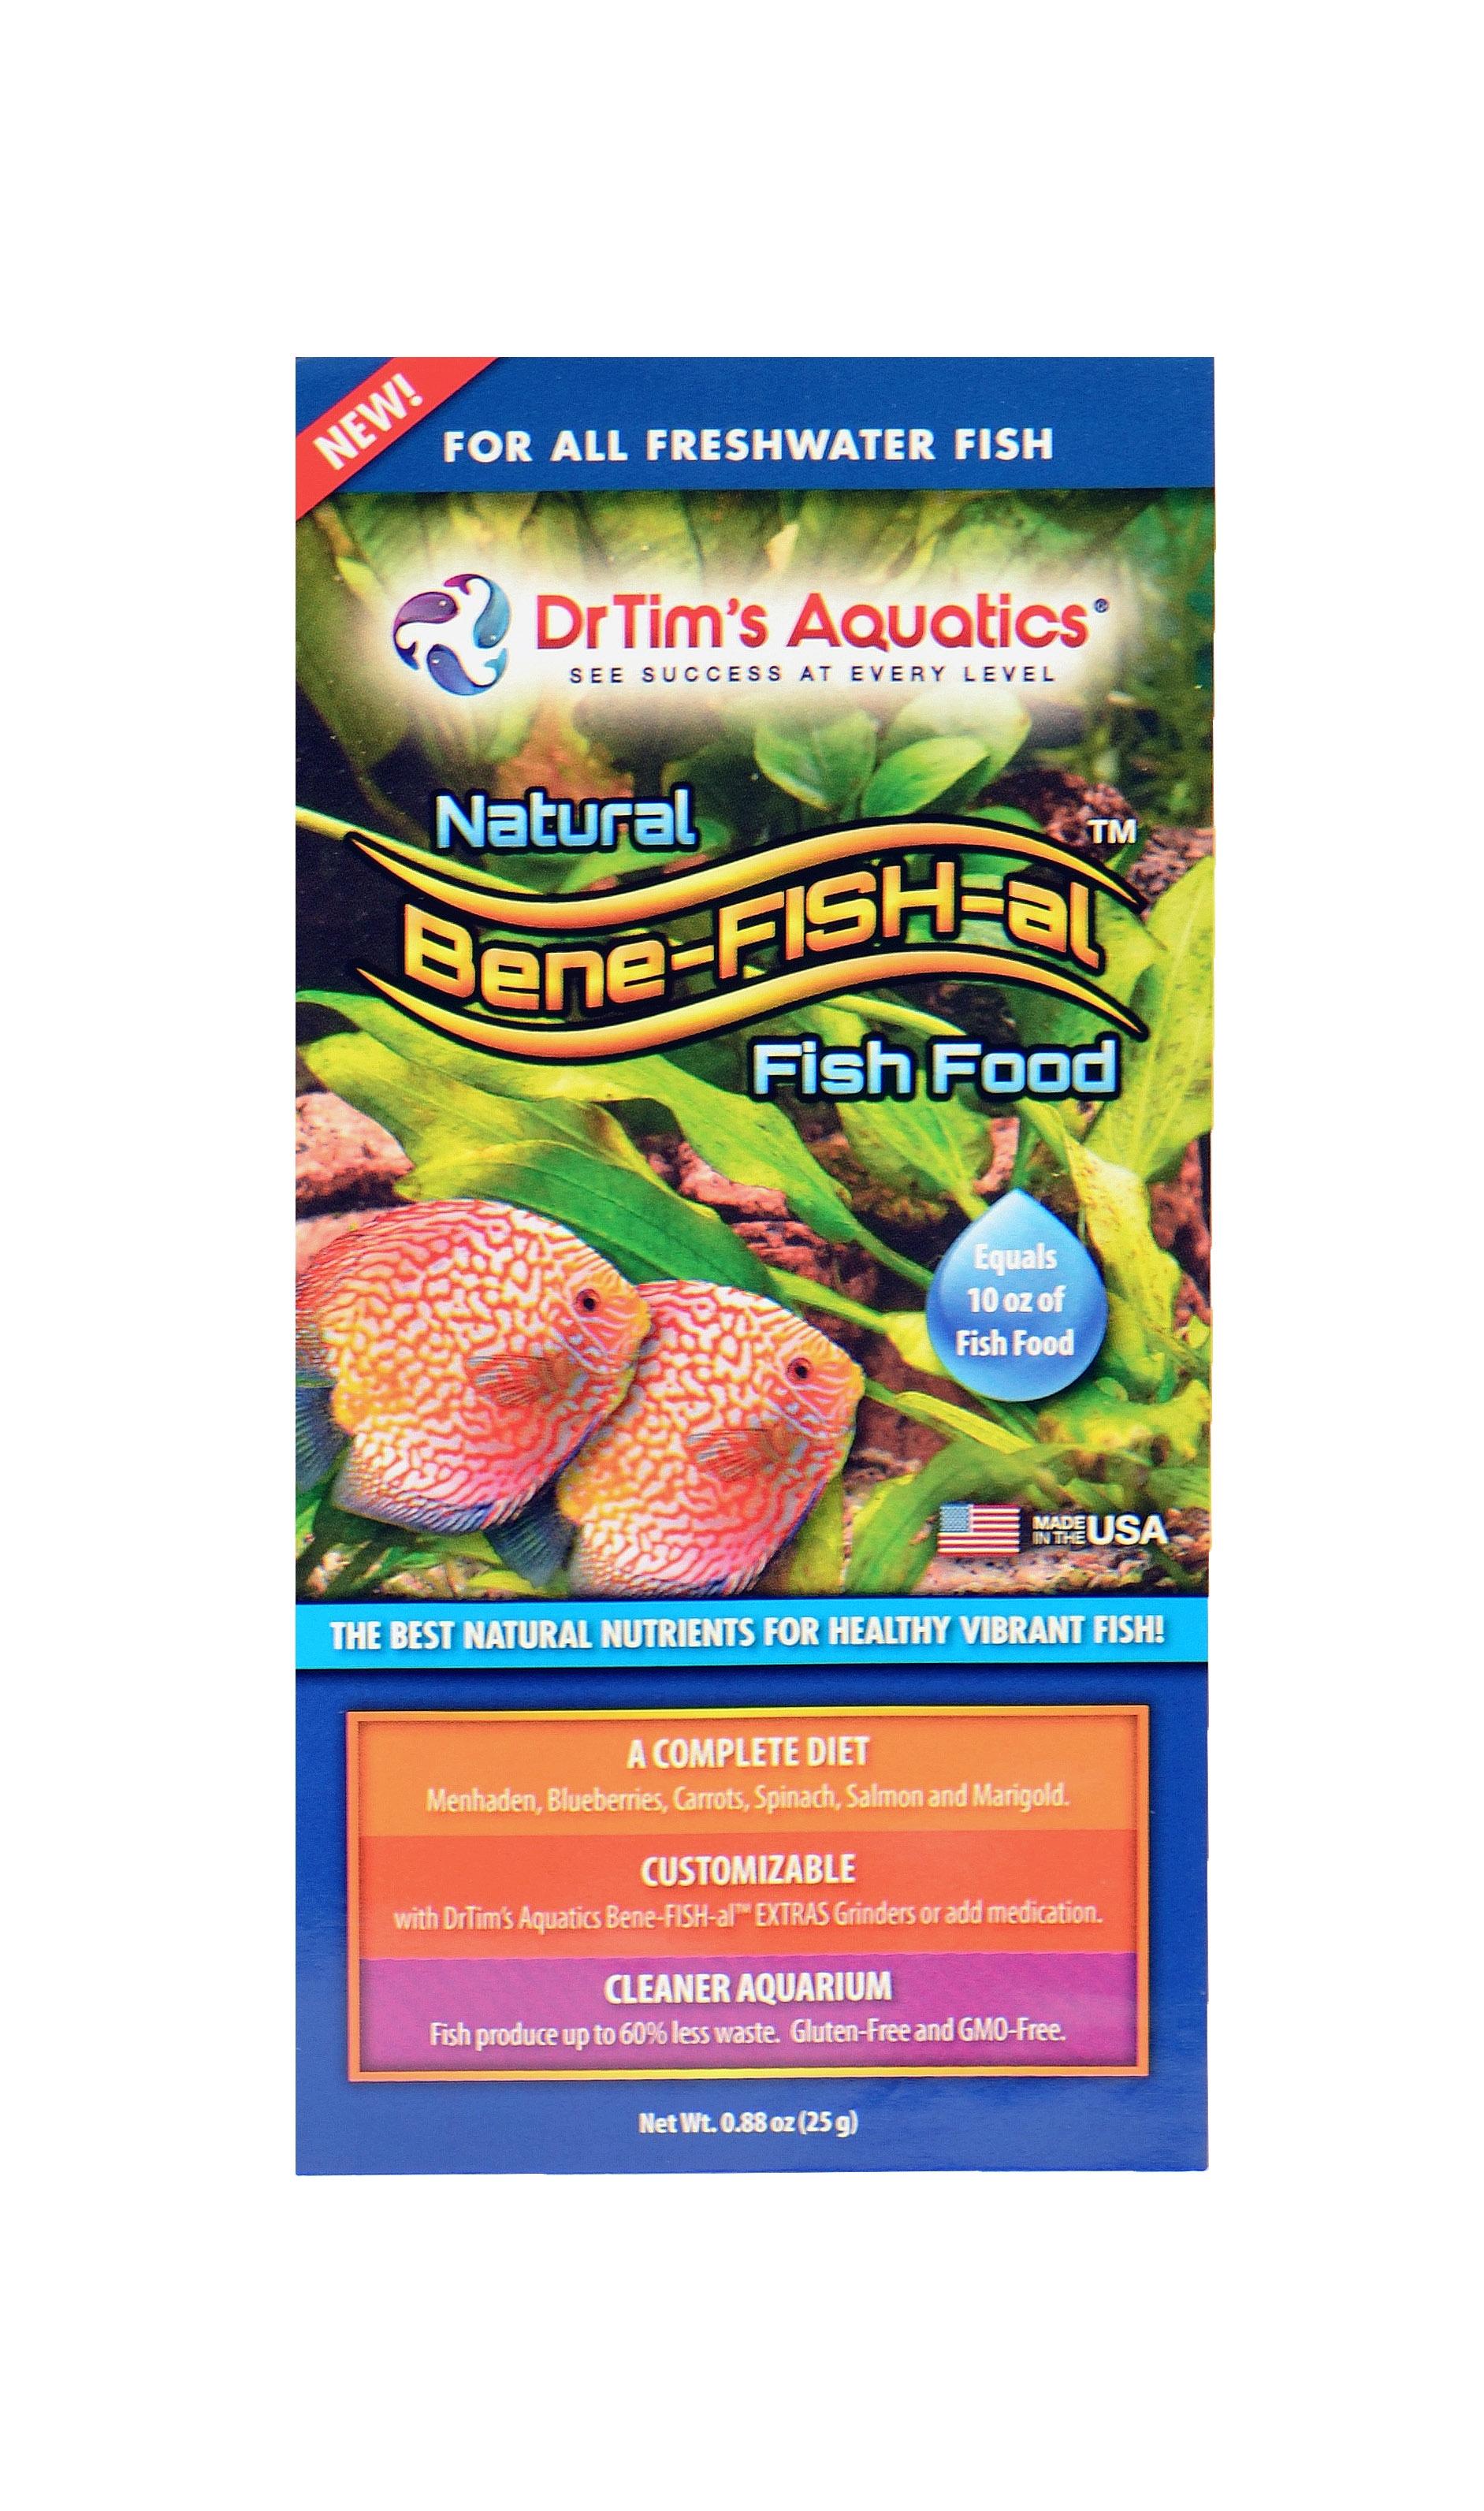 Bene-FISH-al Freshwater Fish Food - Single Pack